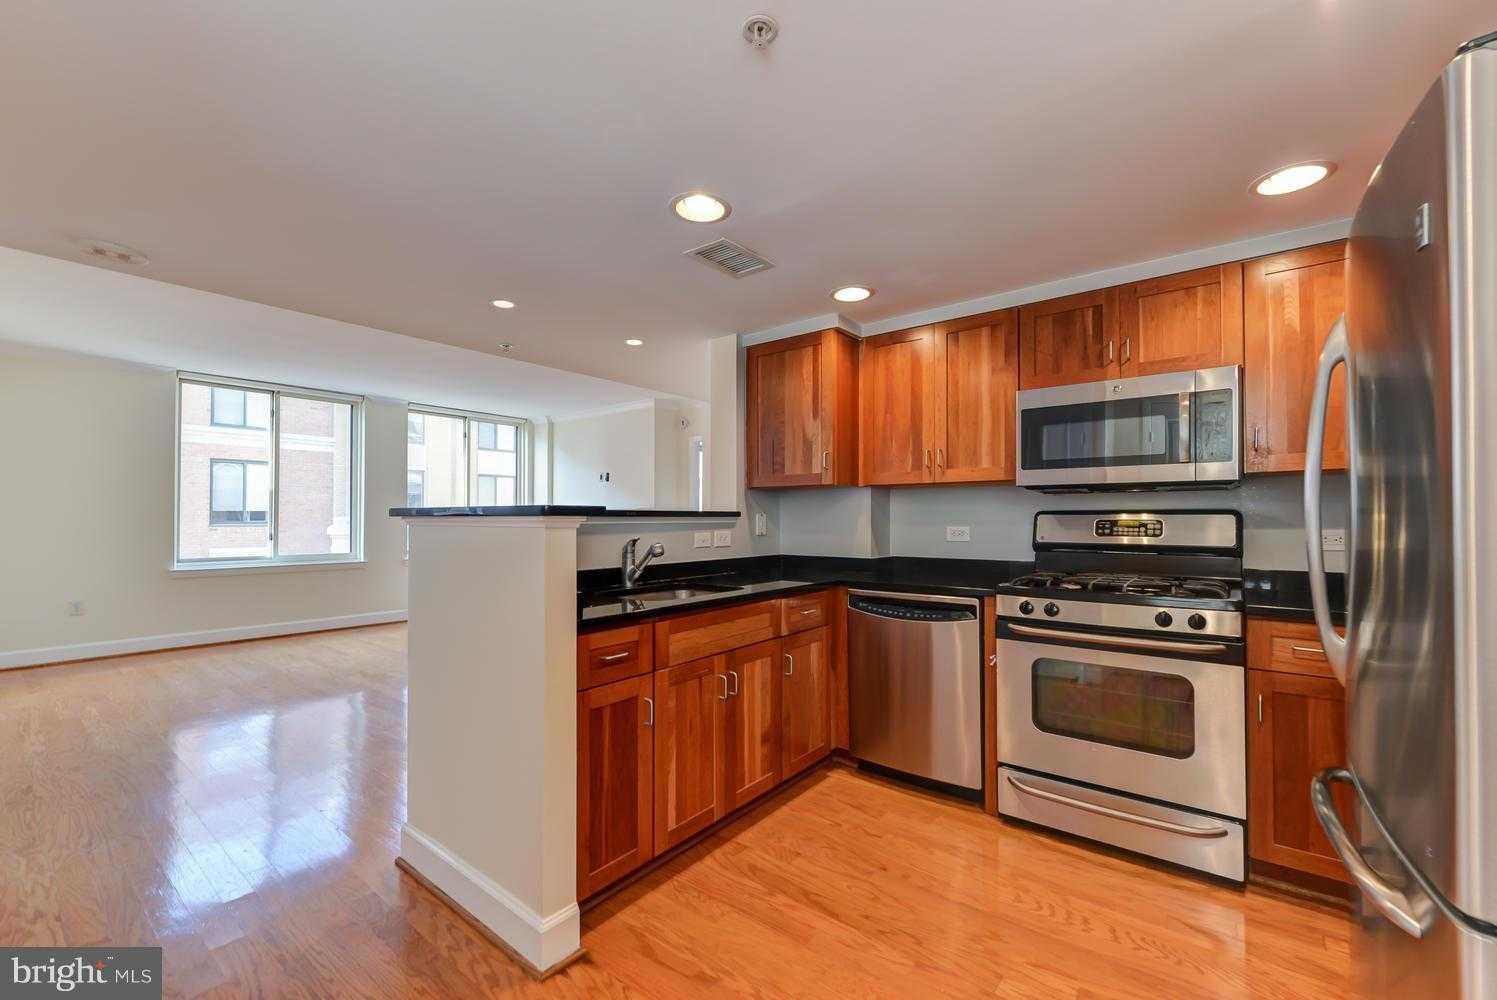 $634900 - 2Br/2Ba - for Sale in Station Square Arlington & Clarendon Homes for Sale | John Mentis